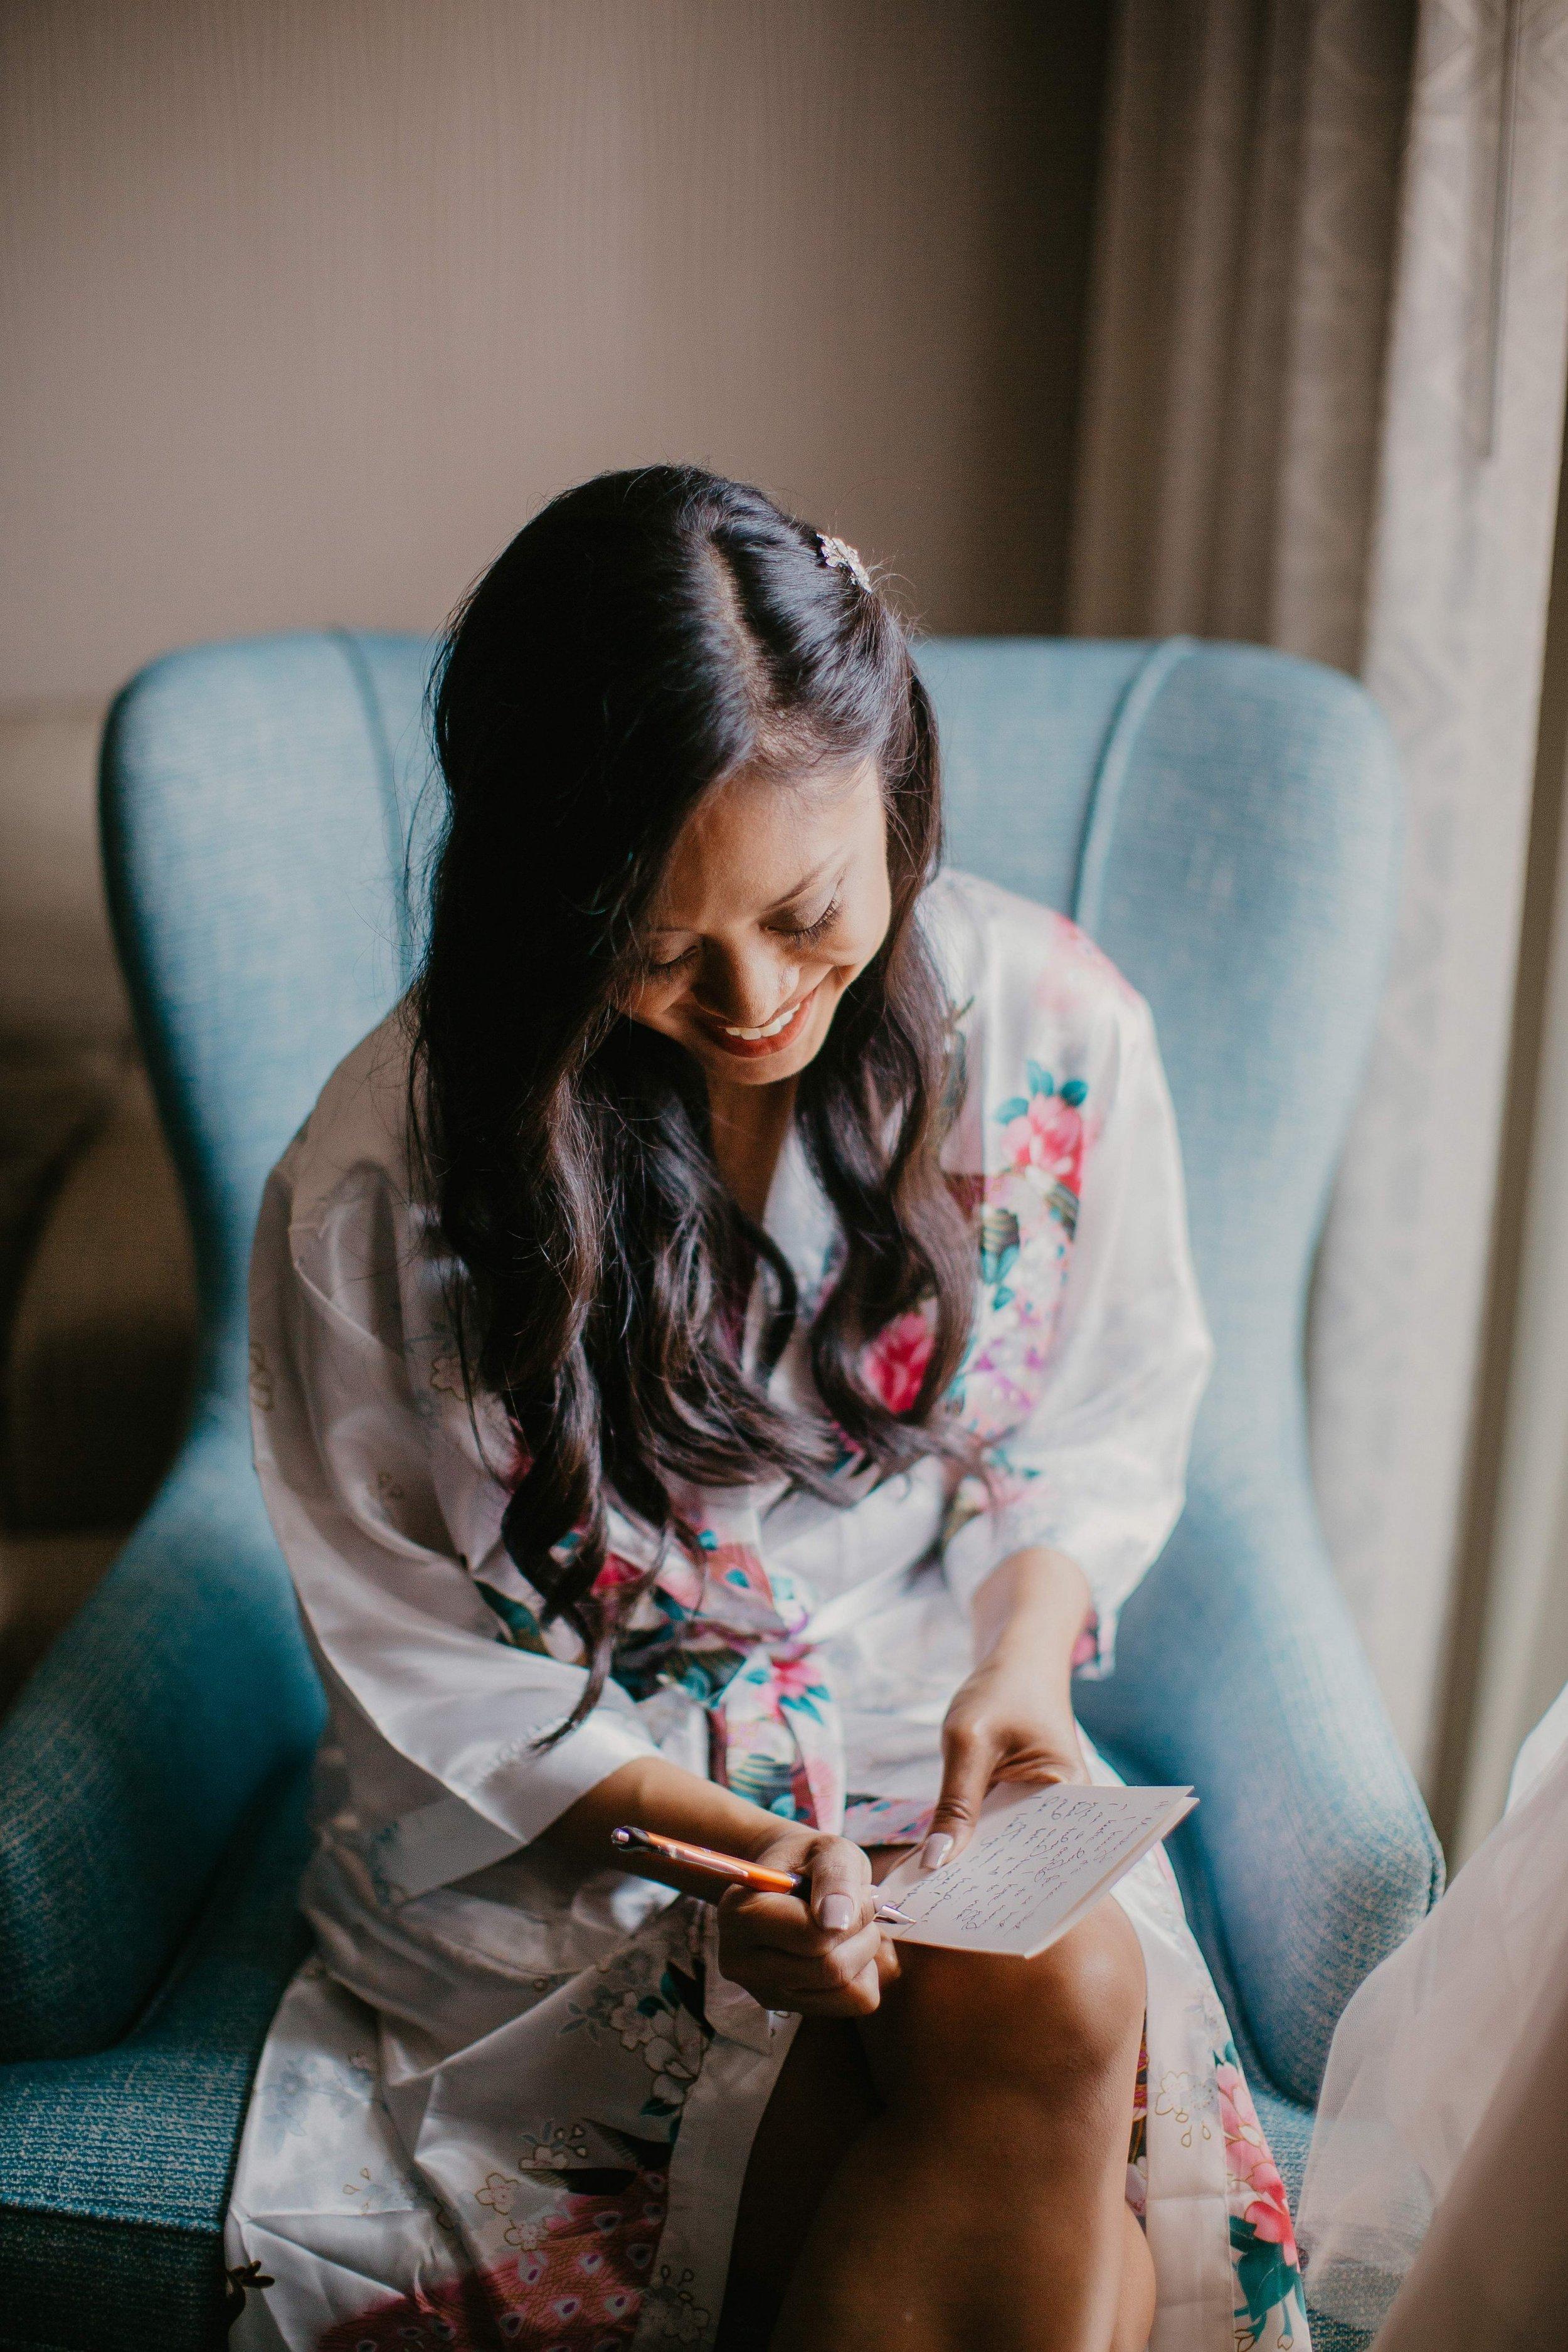 www.santabarbarawedding.com | Candice Marie Photography | Hilton Santa Barbara Beachfront Resort | Dalina Klan | Once in a Lifetime Weddings | Absolutely Fabulous Glamour | Bride Getting Ready